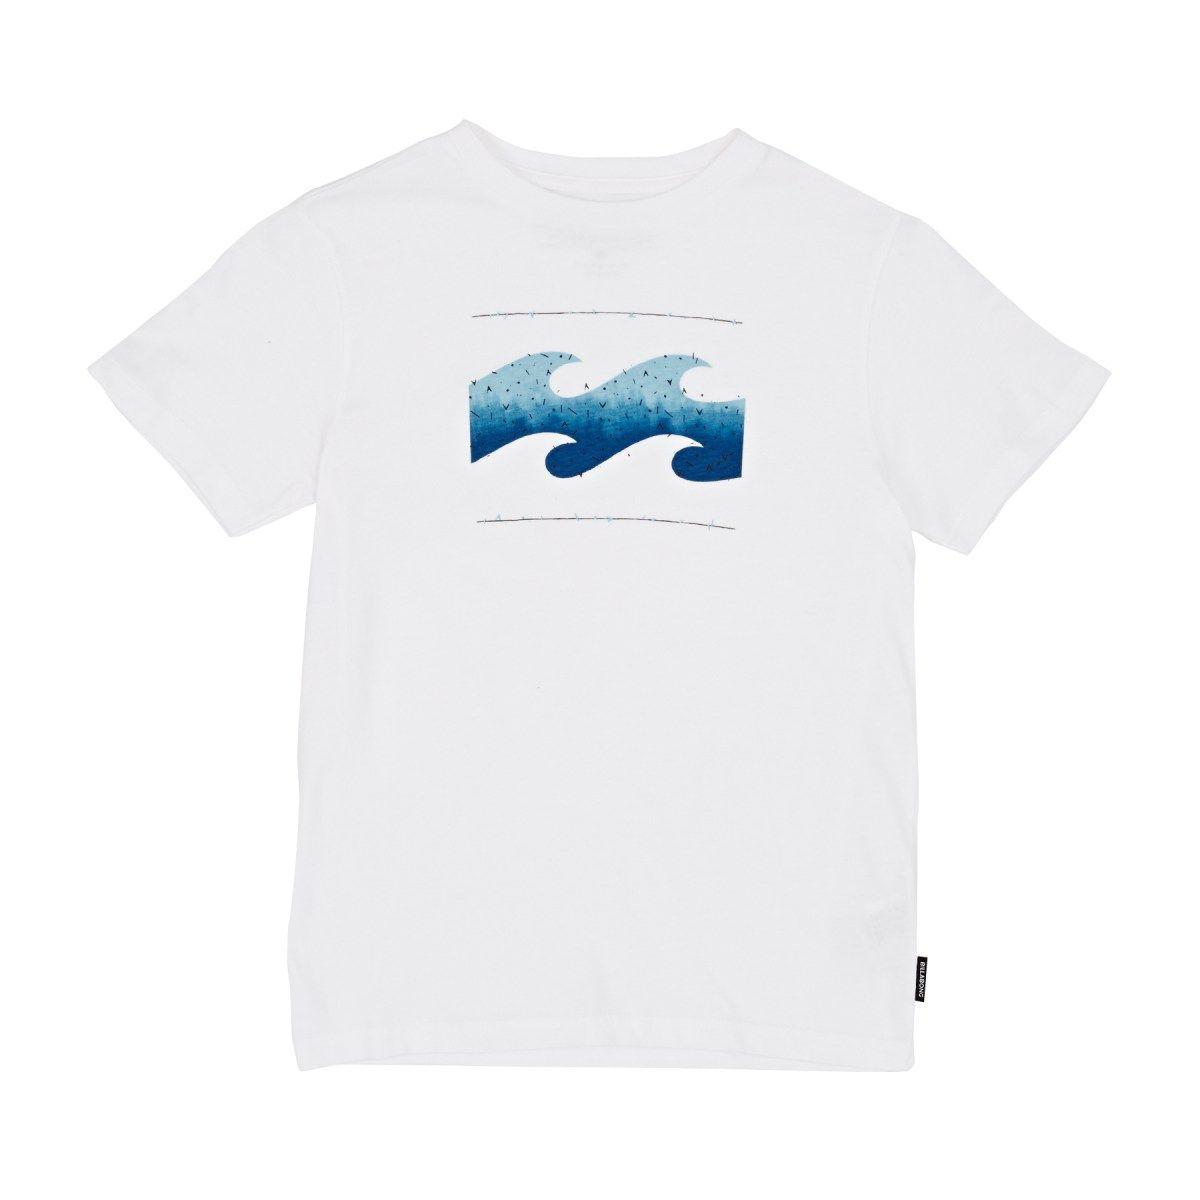 Billabong T-shirts - Billabong Hashed Wave Boys T-shirt - White